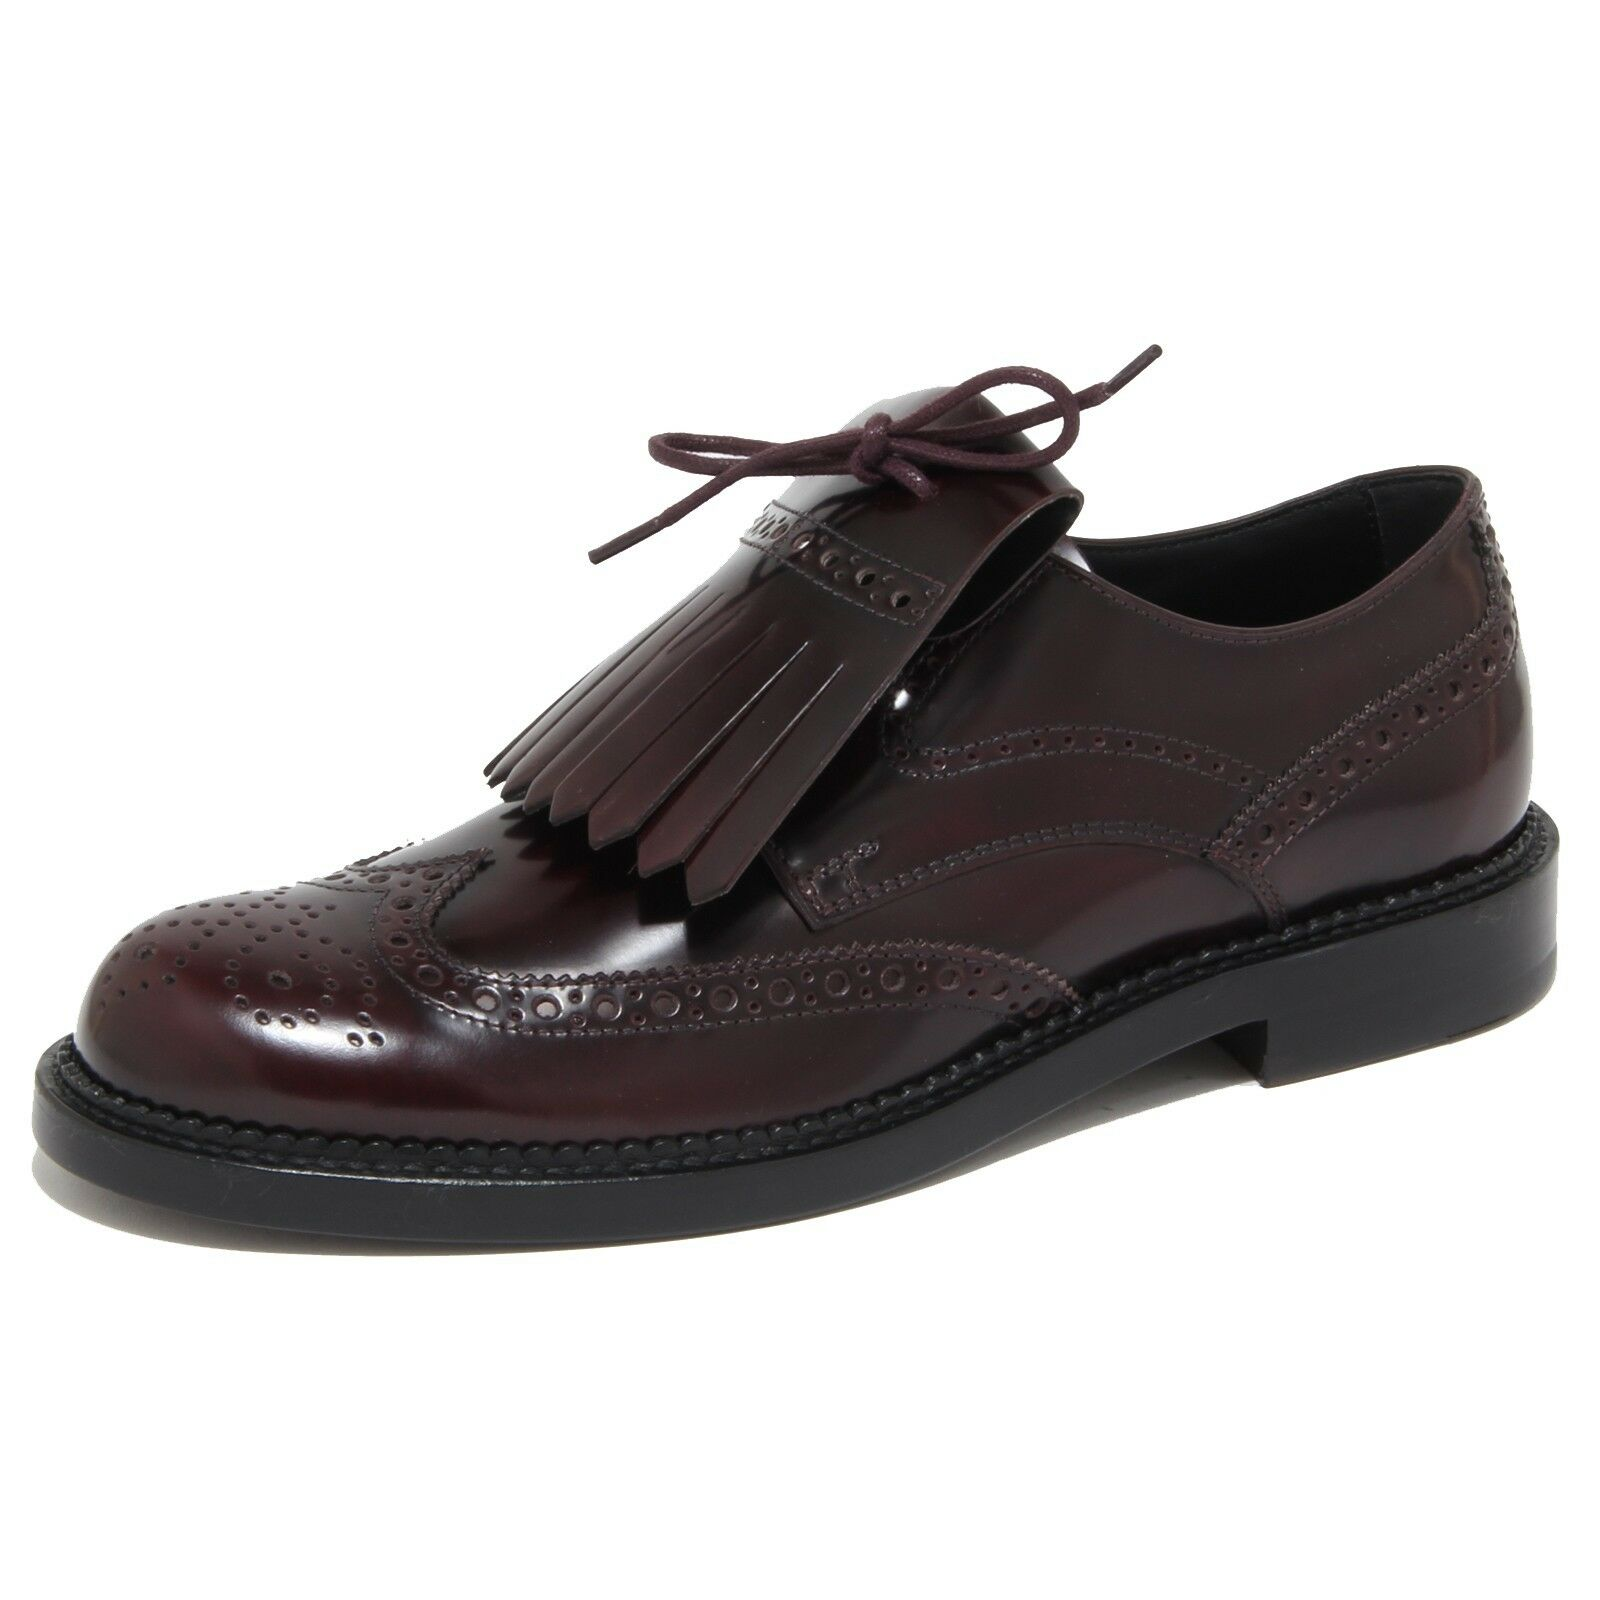 6974N scarpa uomo TOD'S bordeaux bordeaux bordeaux Scarpe man frangia removibile c5e8e1